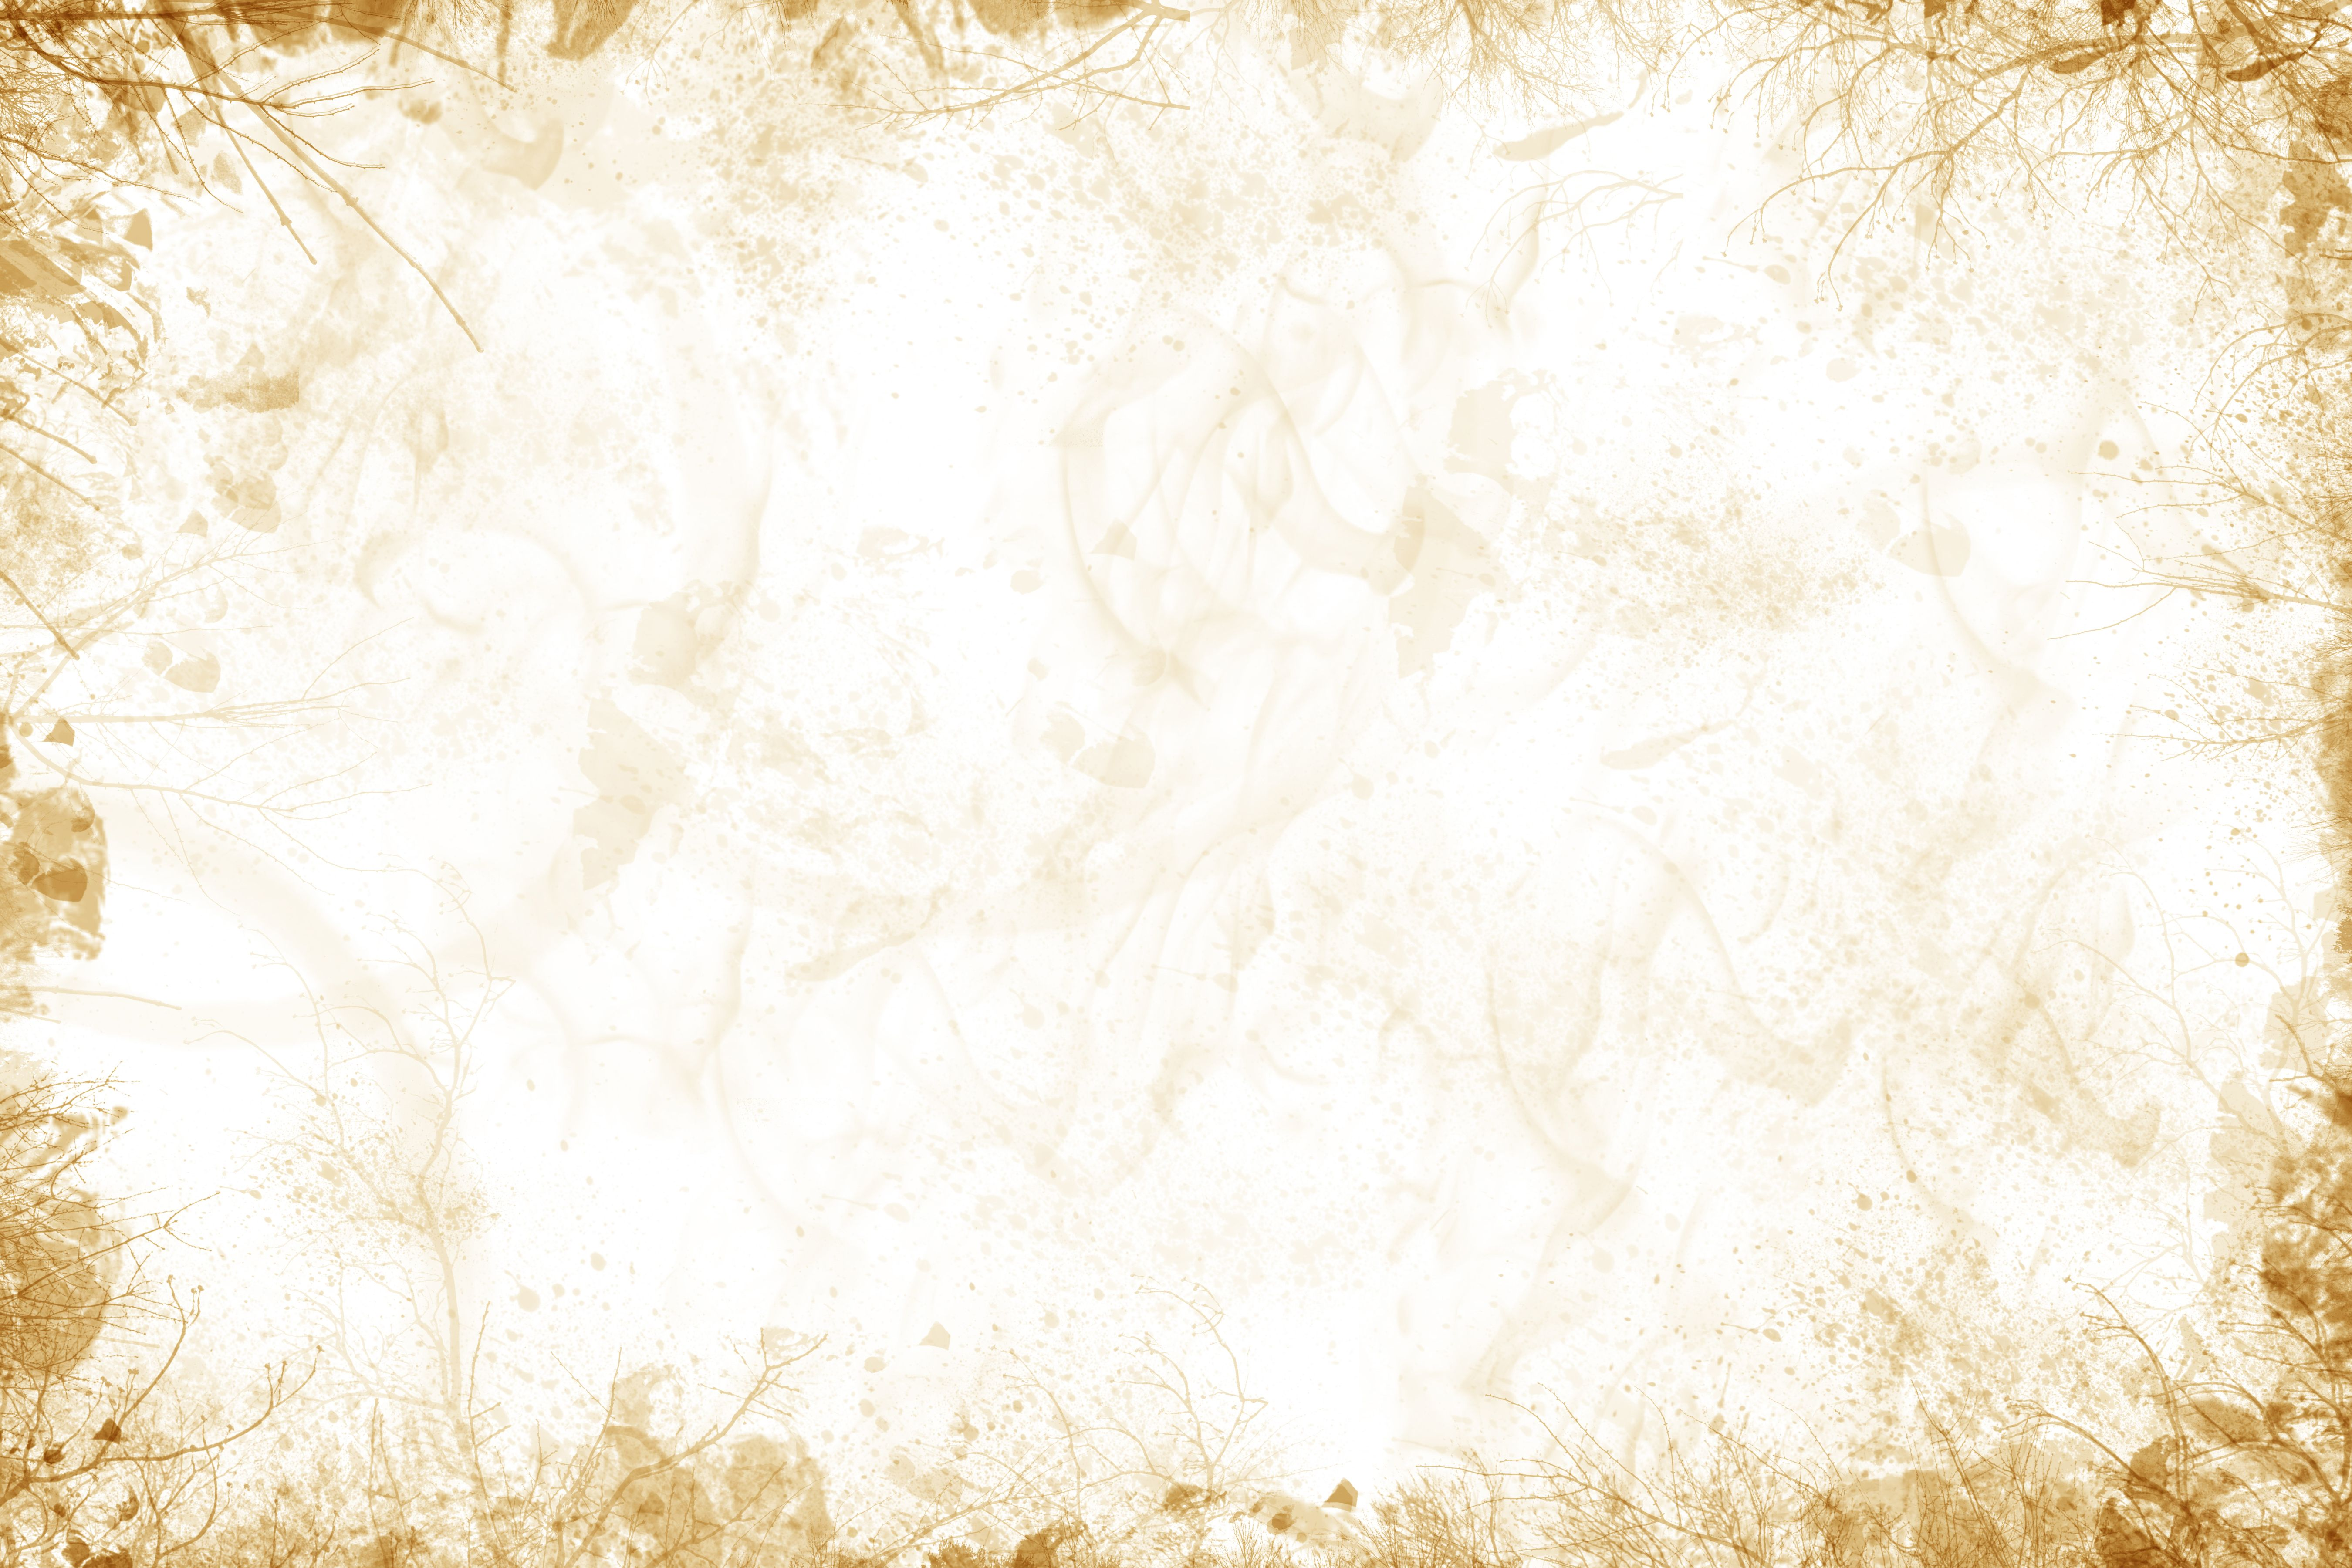 Abstract light beige frame border design Light Beige Frames 5400x3600